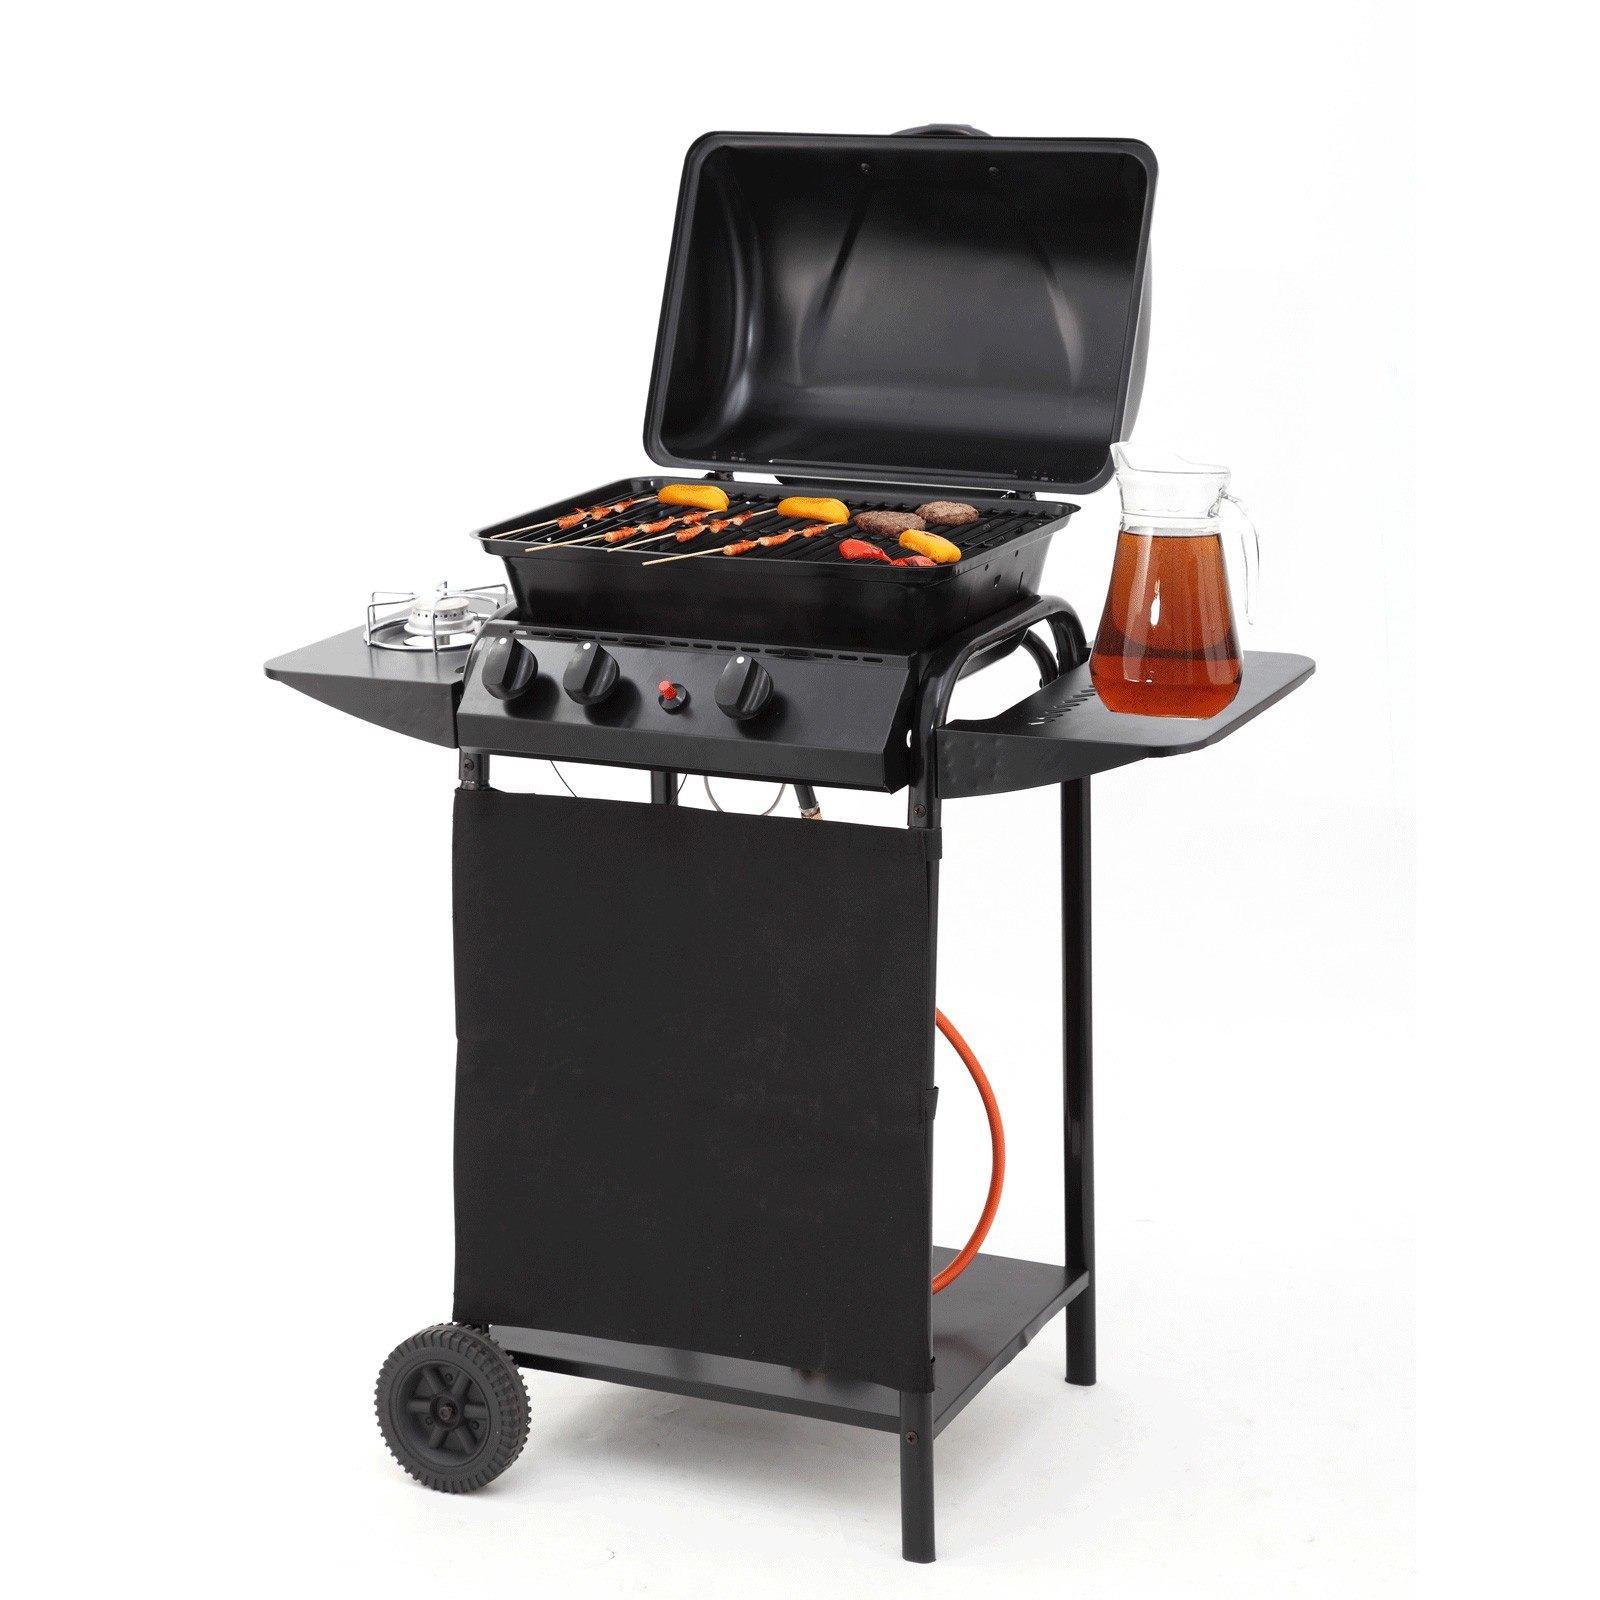 tepro gasgrill norton grillwagen doppelbrenner outdoor cooking gas grill schwarz ebay. Black Bedroom Furniture Sets. Home Design Ideas